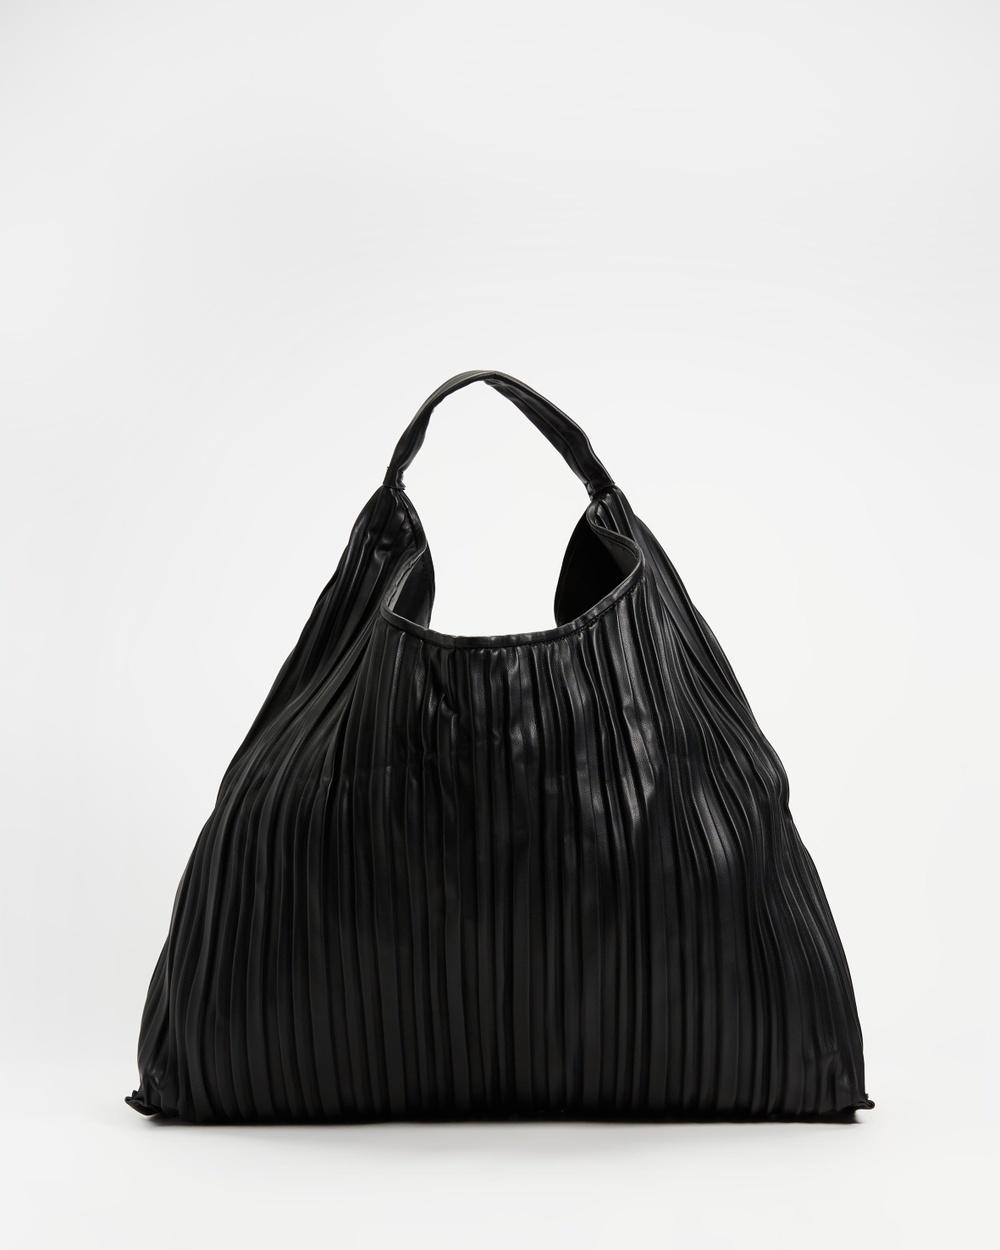 M.N.G Deri Slouch Bag Handbags Black